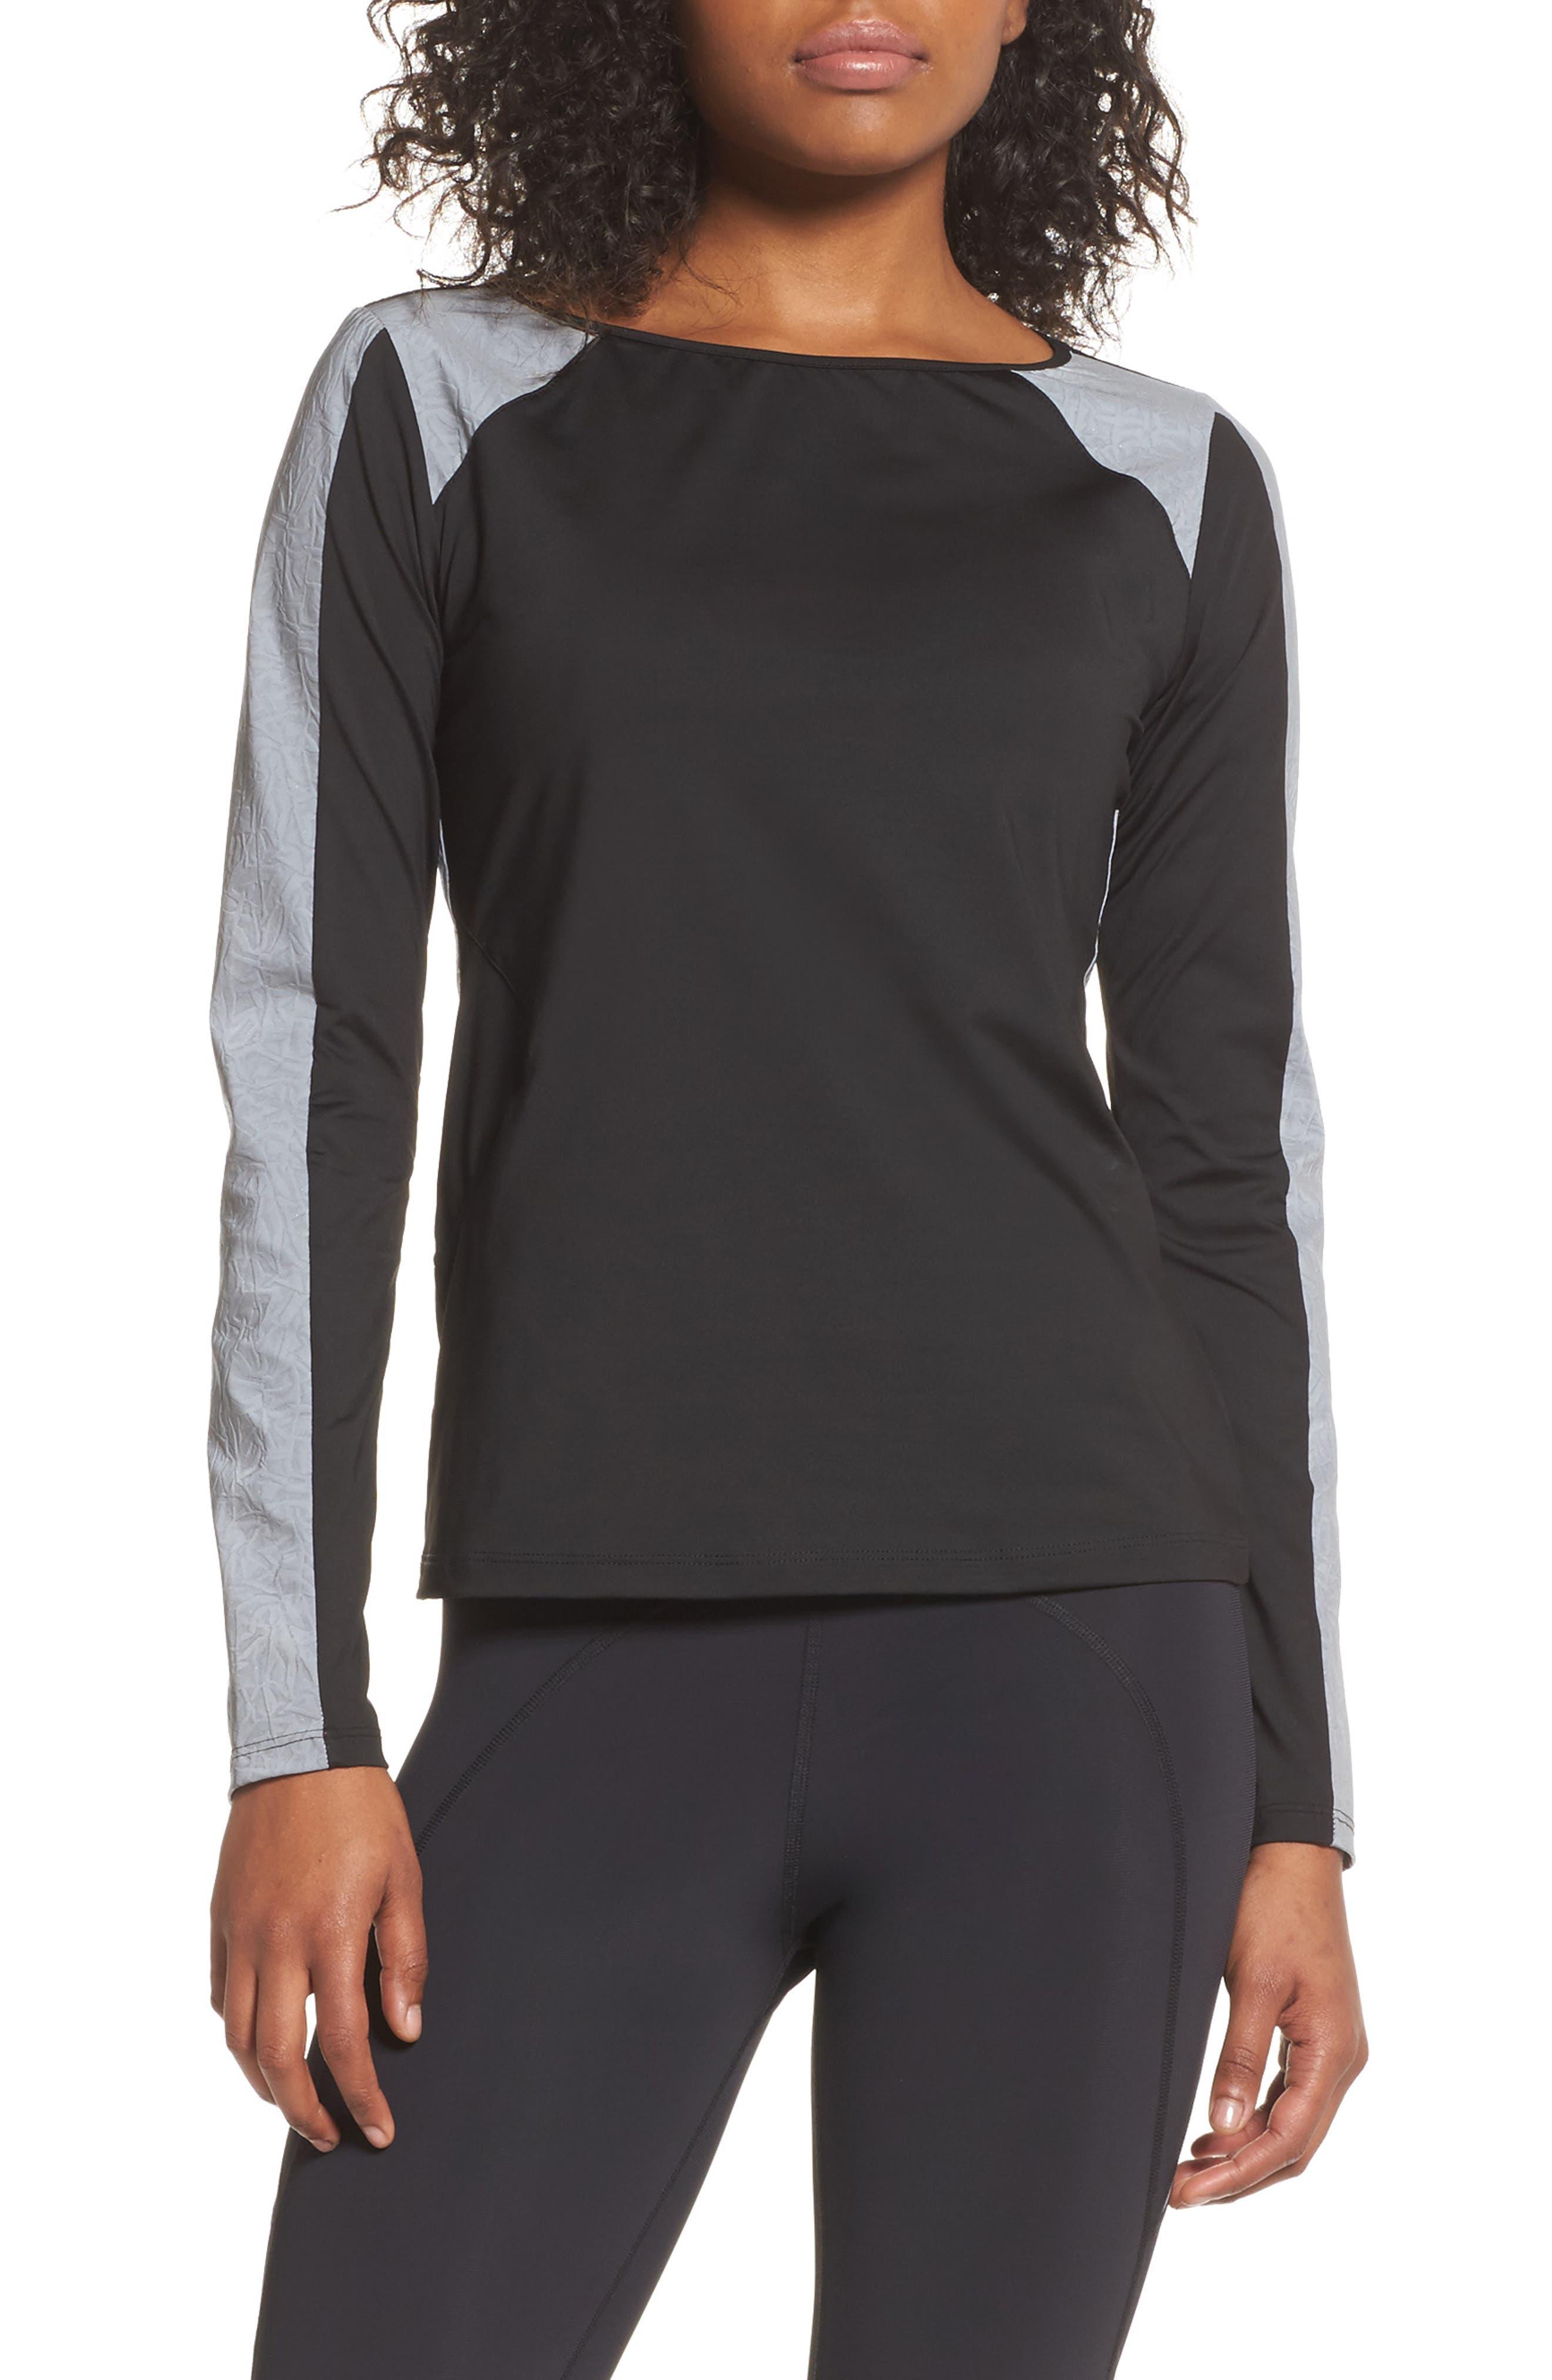 BoomBoom Athletica Reflective Body-Con Long Sleeve Tee,                         Main,                         color, Black/Reflective